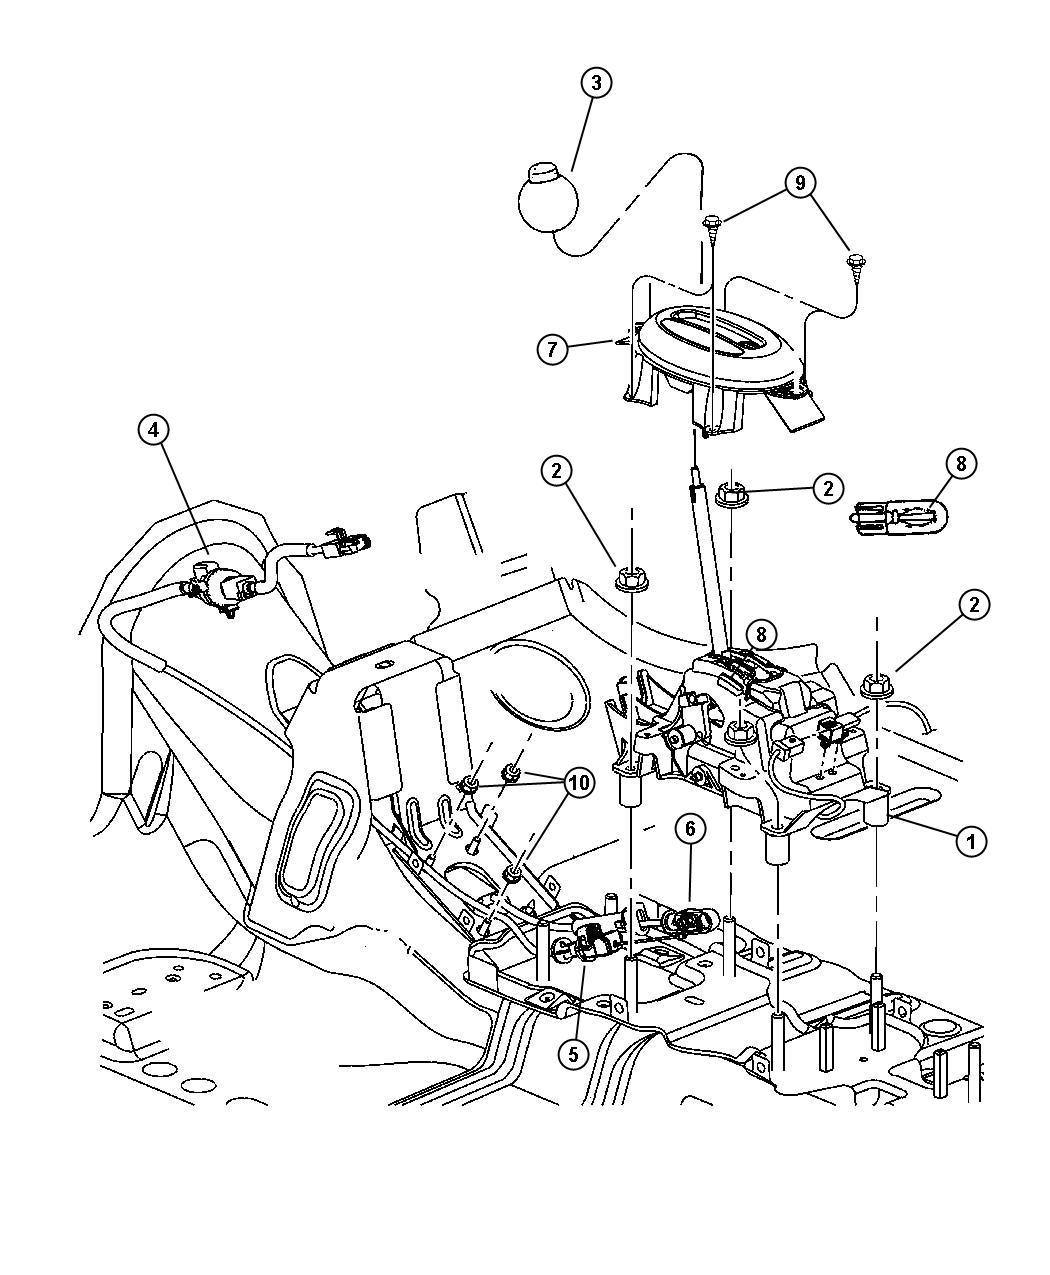 Chrysler Pt Cruiser Gearshift Controls